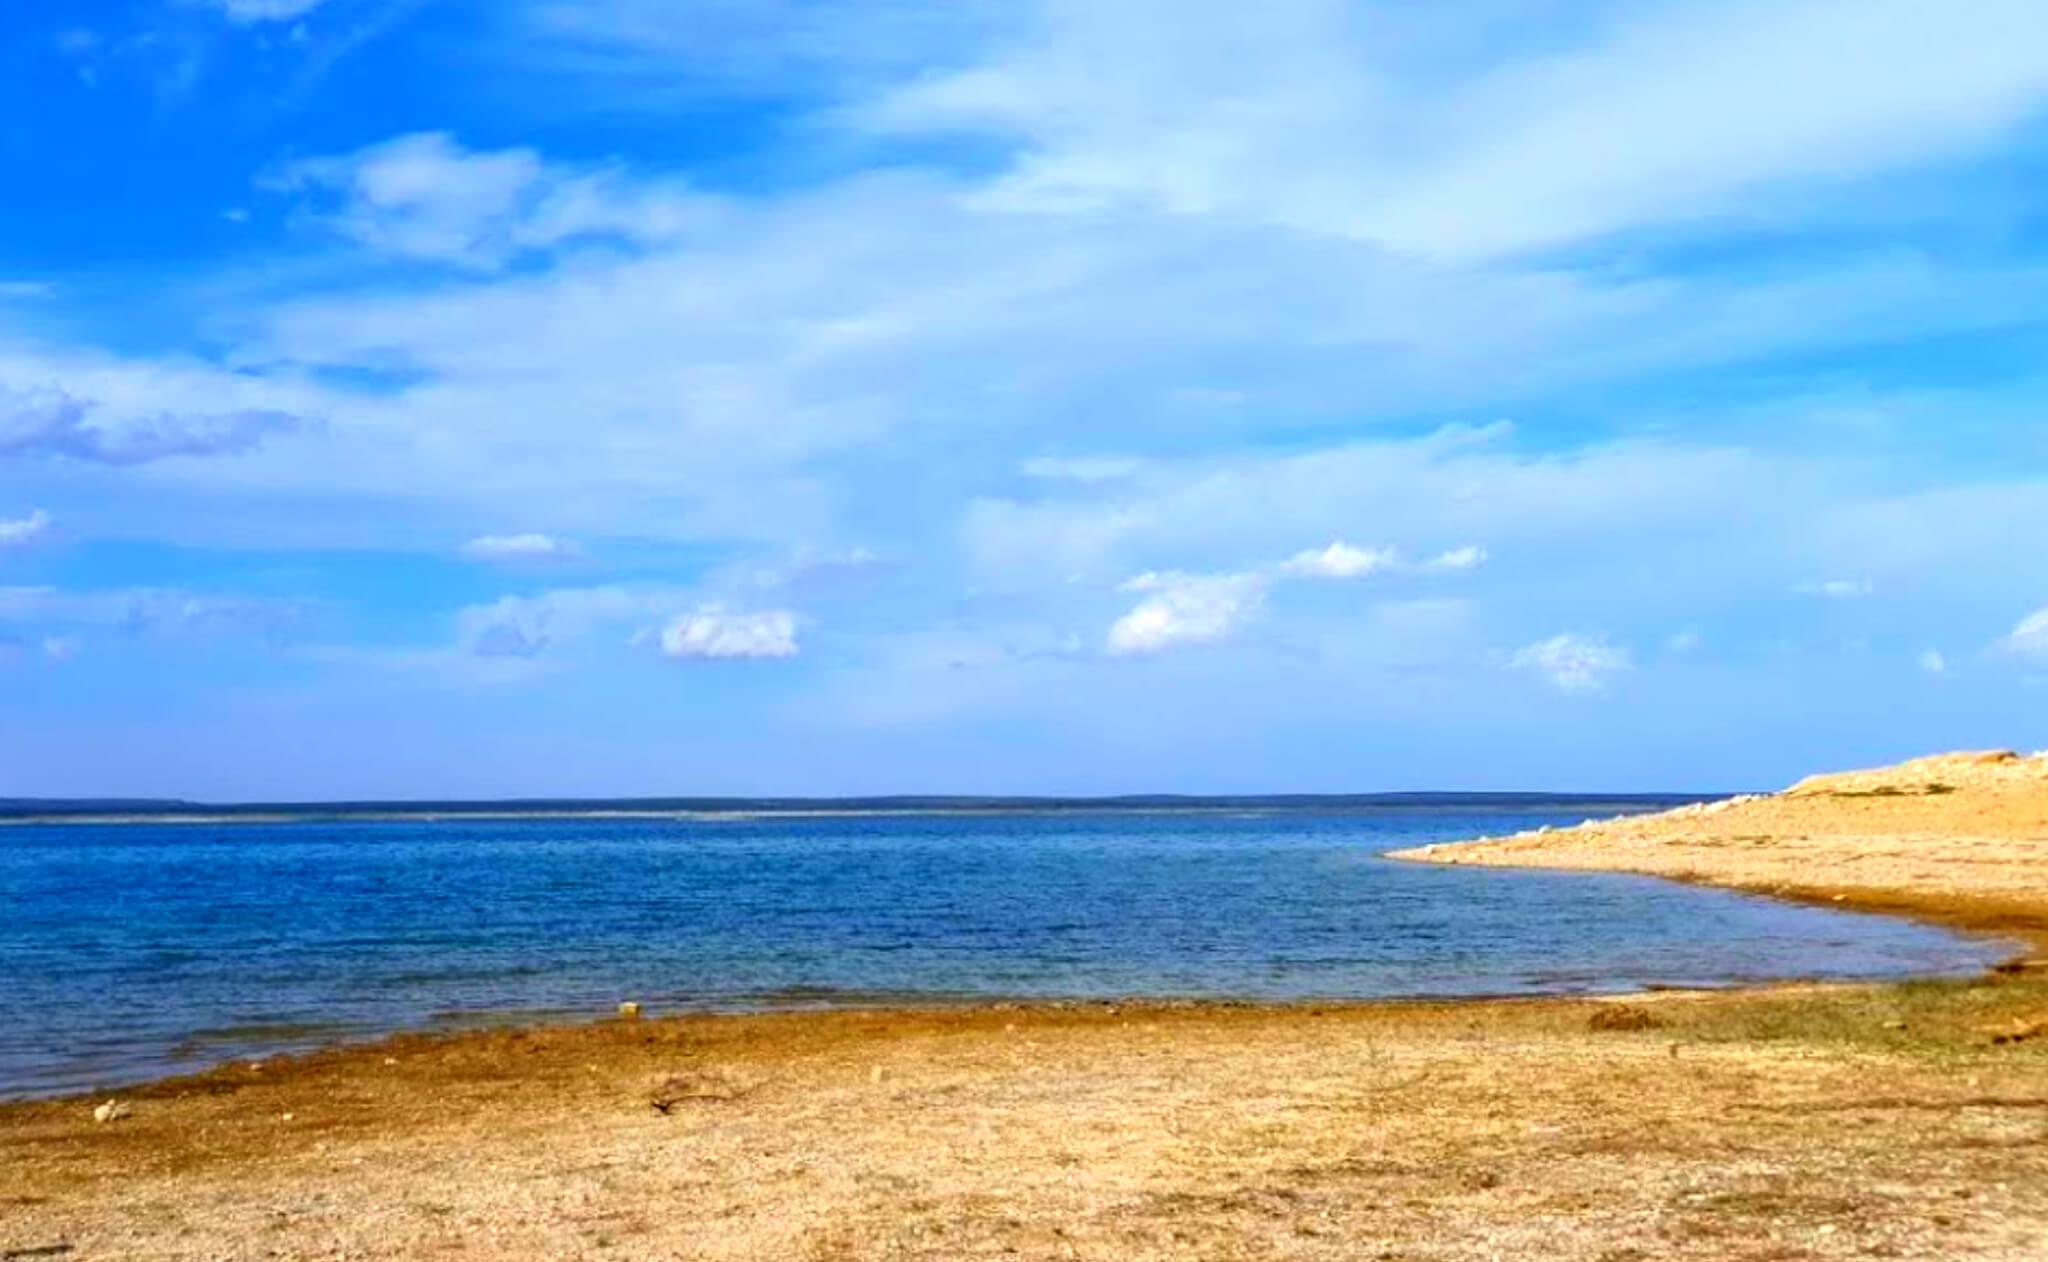 Amistad-Lake-Fishing-Report-Guide-Texas-TX-01